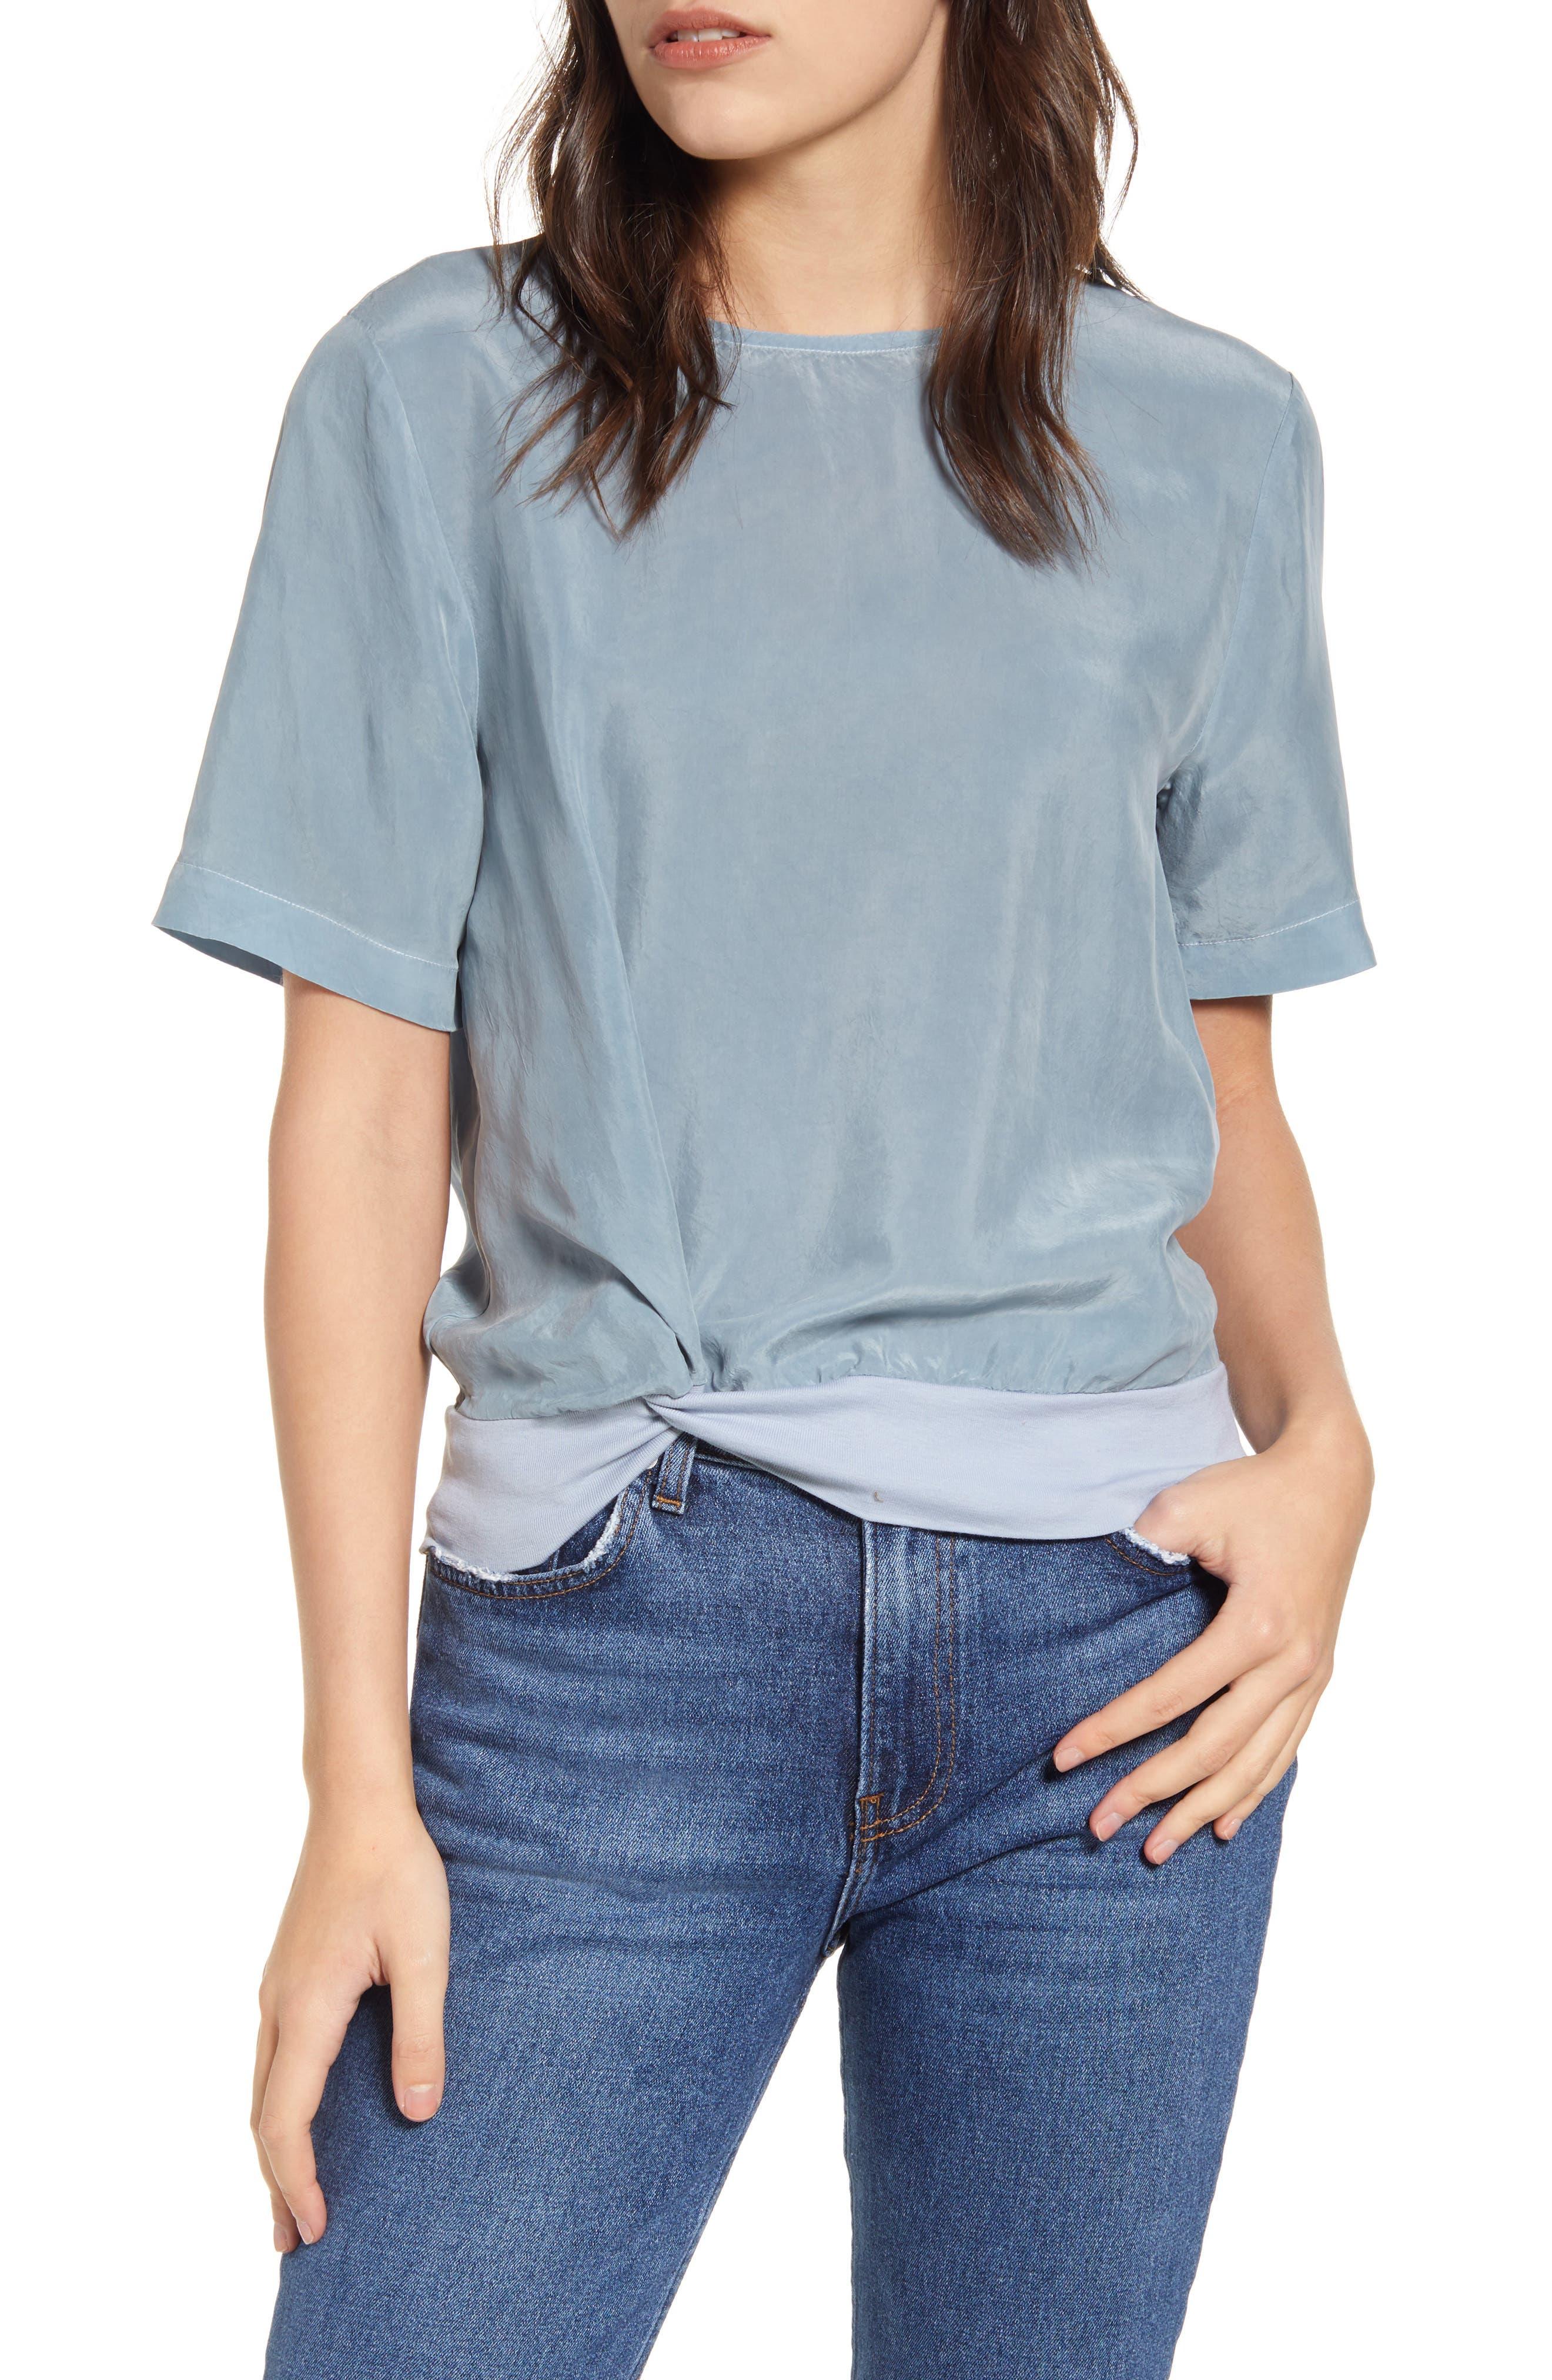 Image of Stateside Cupro Twist Short Sleeve Top